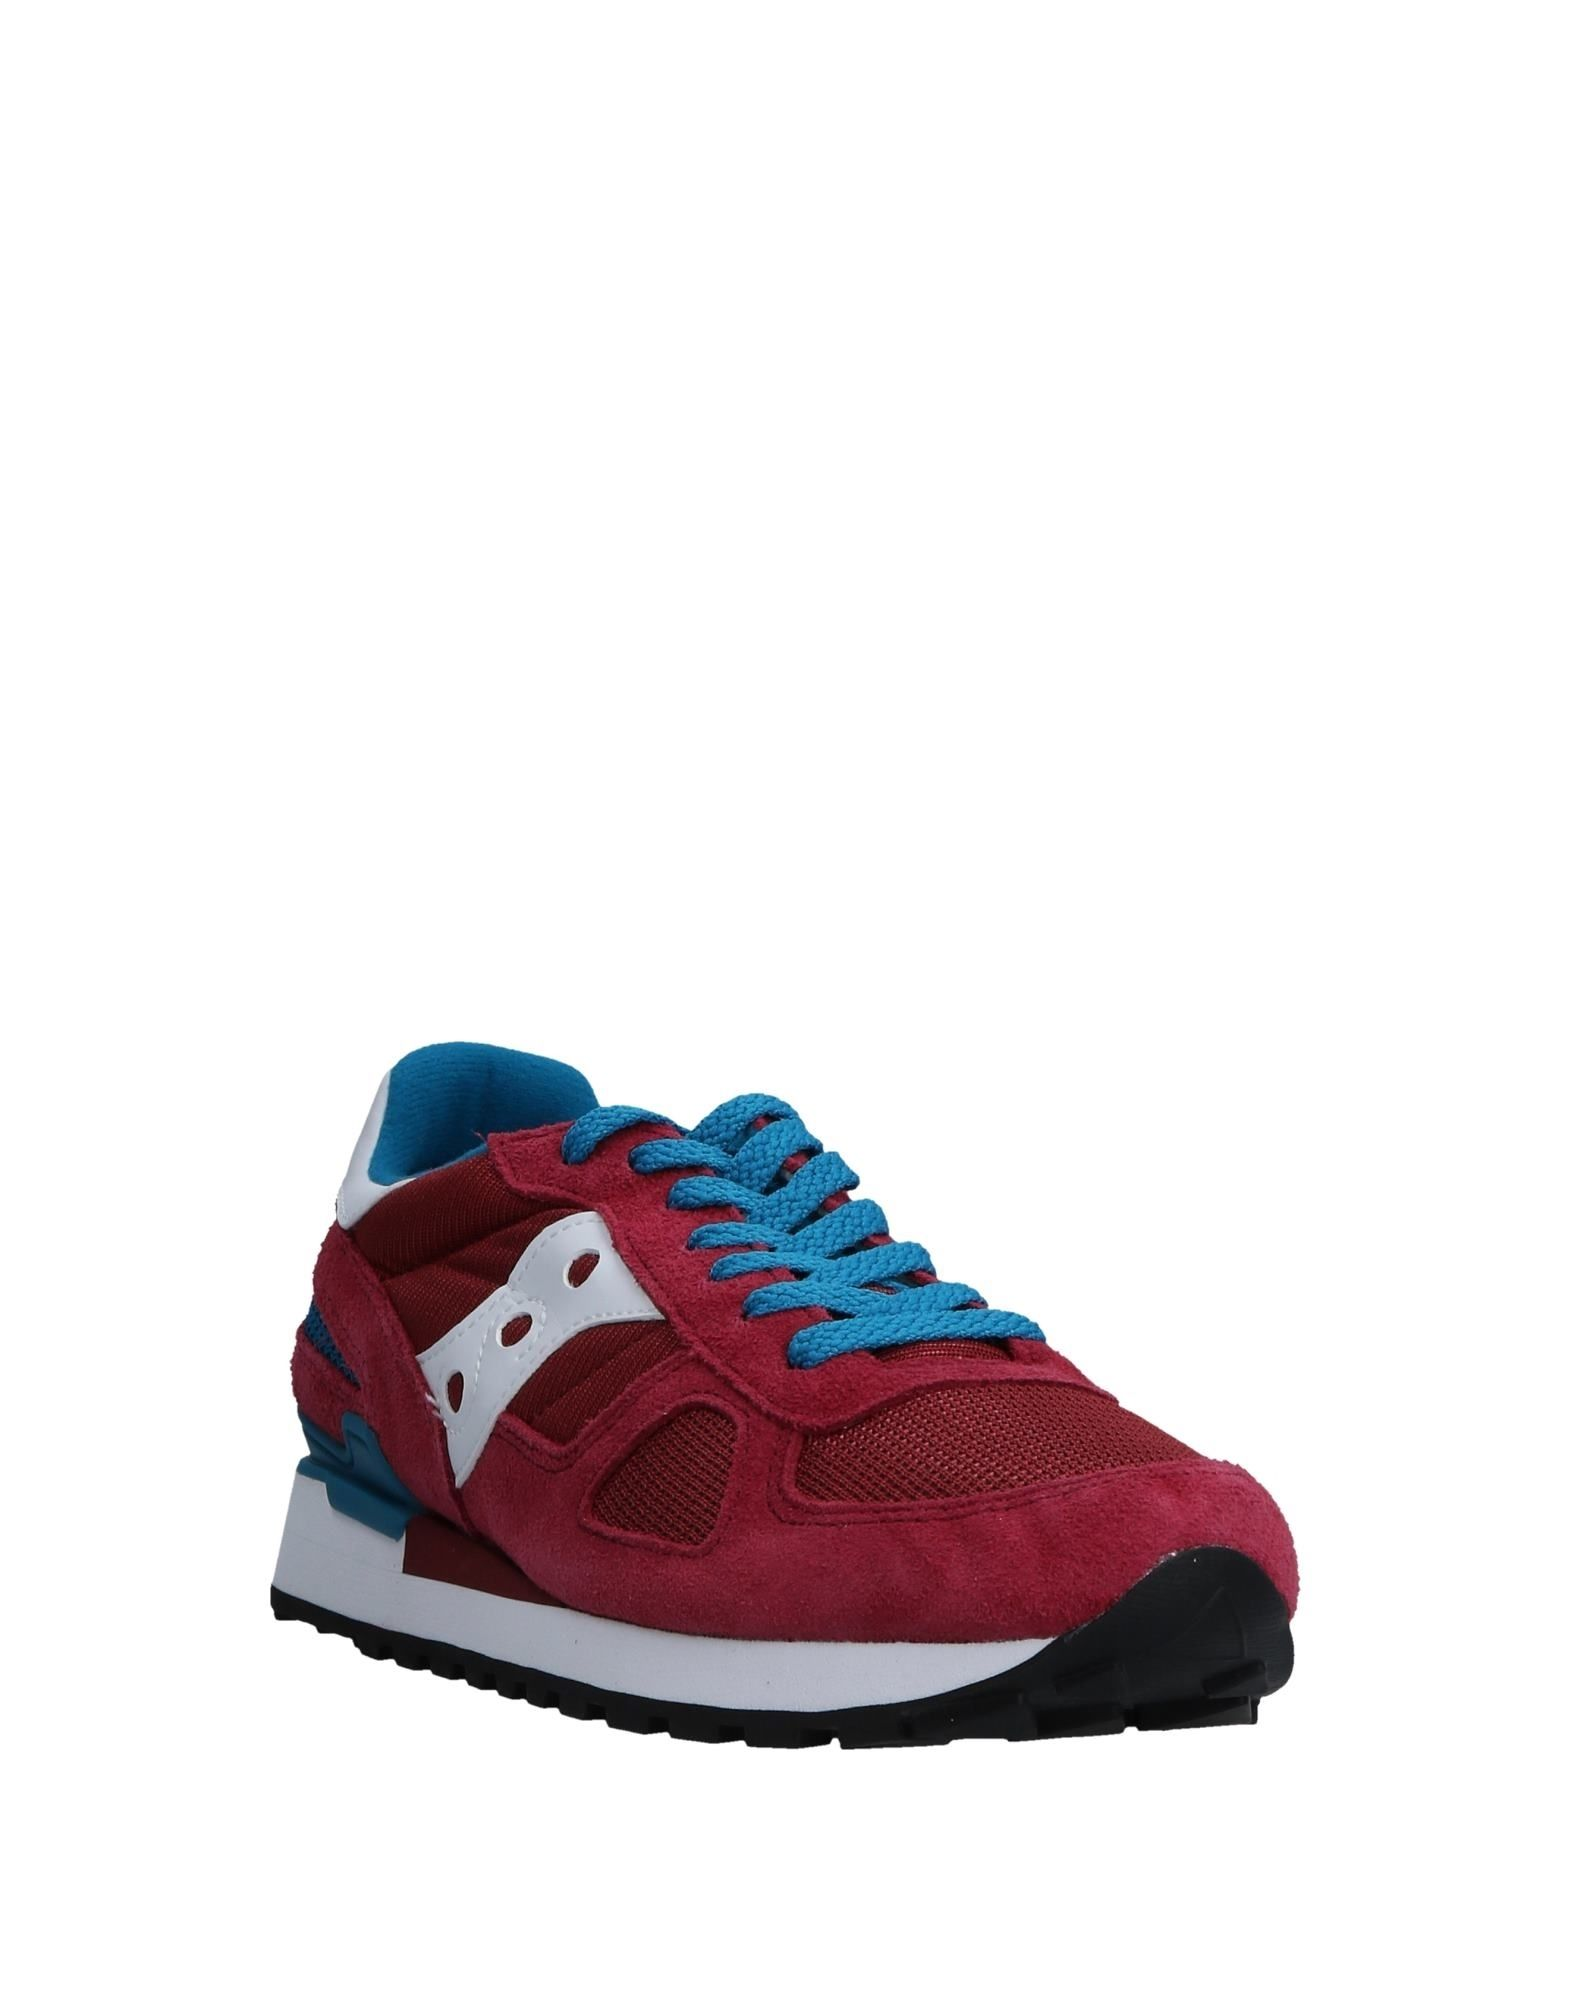 Rabatt echte  Schuhe Saucony Sneakers Herren  echte 11526211JR 2e0b1a